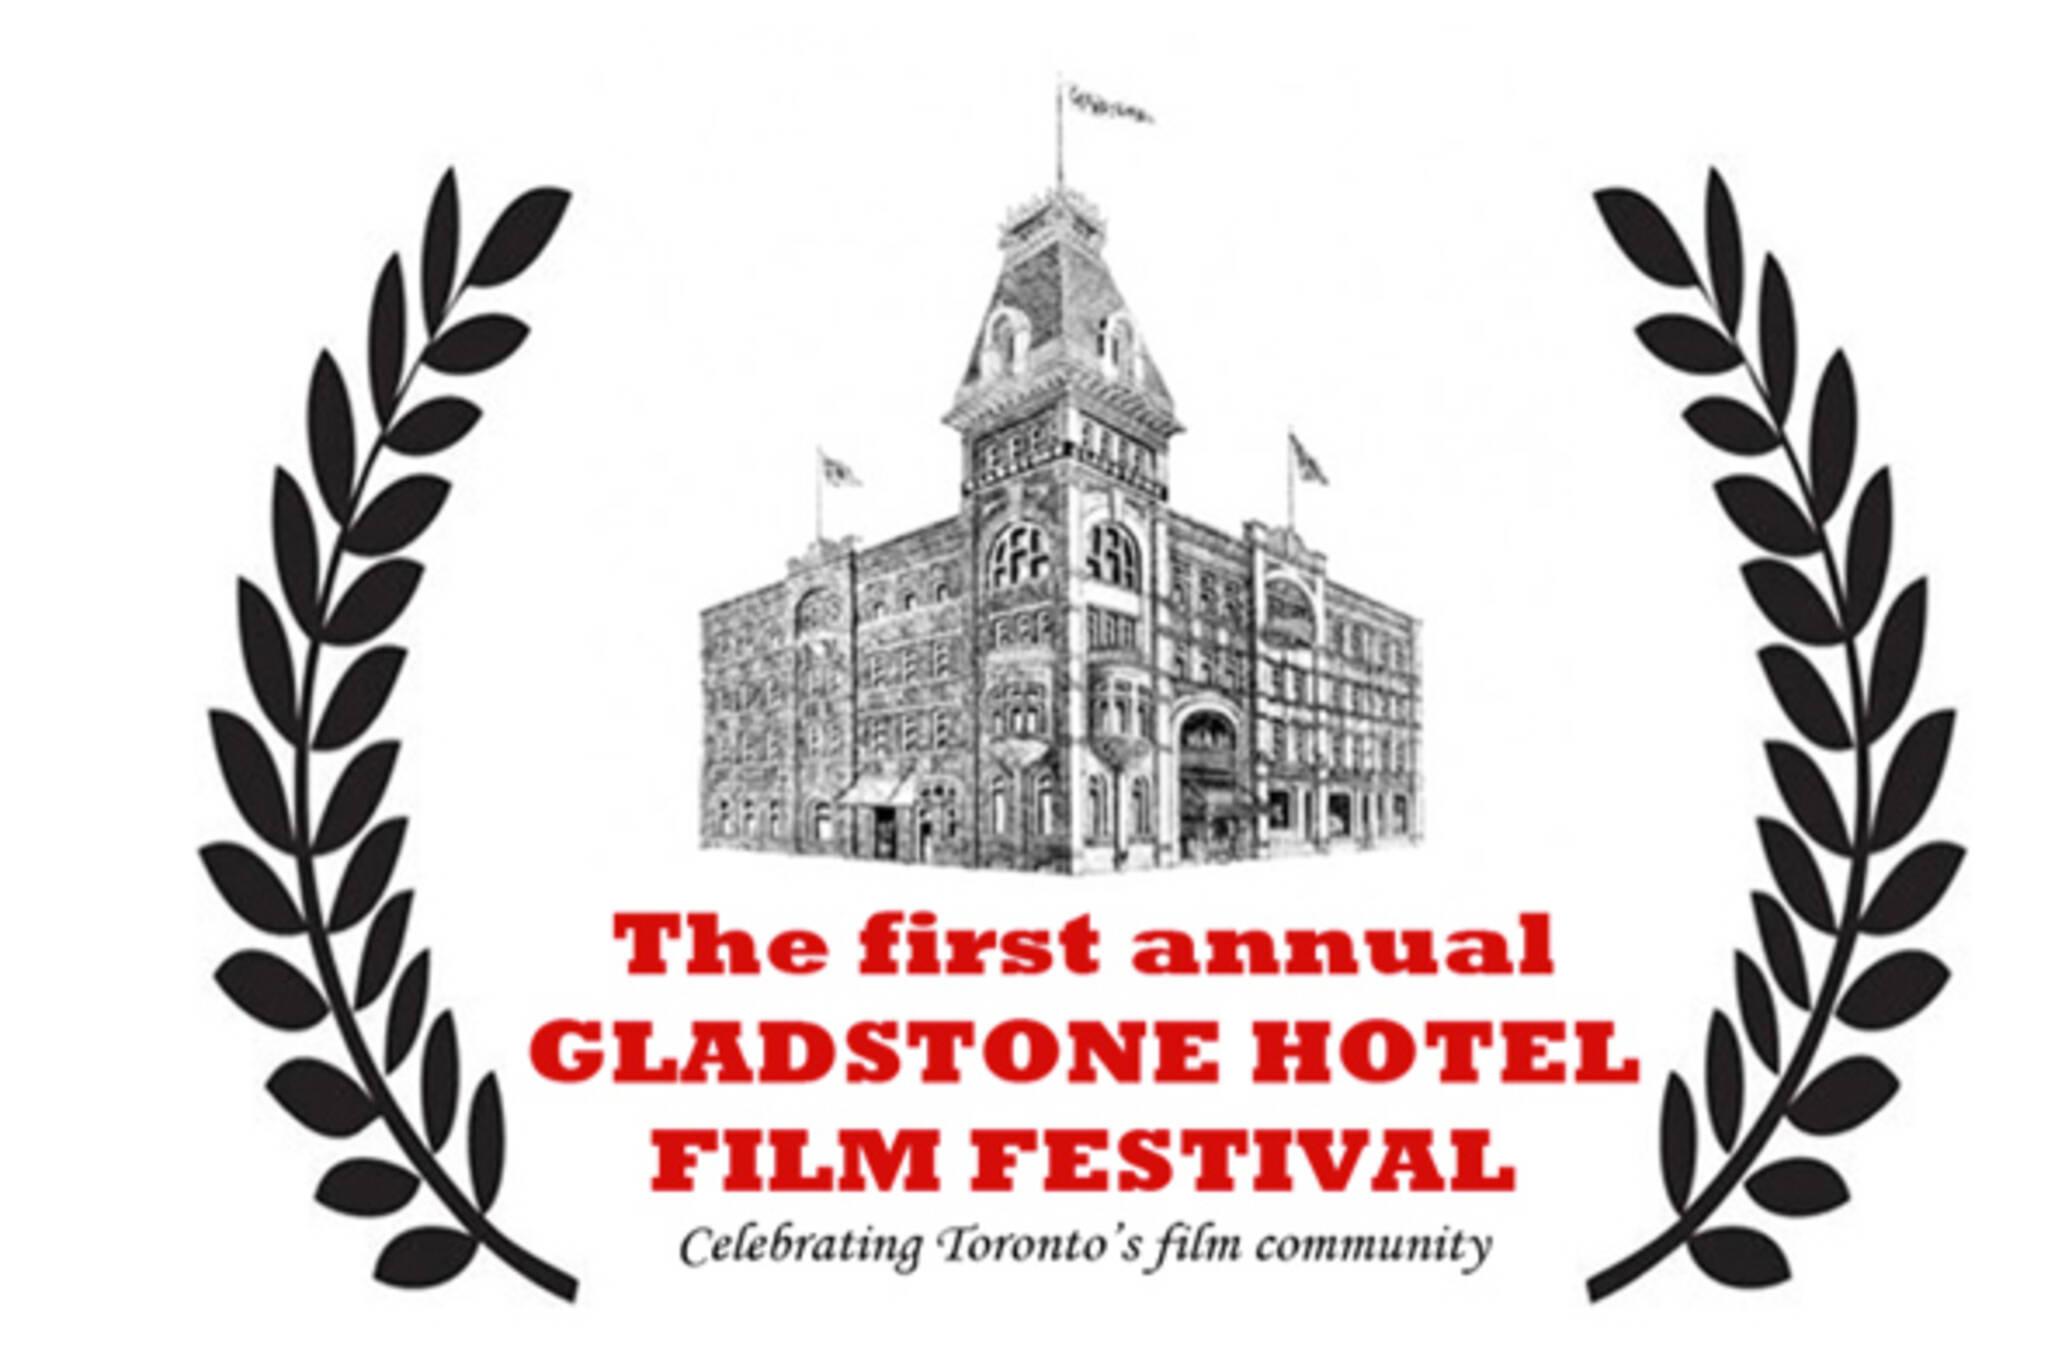 Gladstone Hotel Film Festival